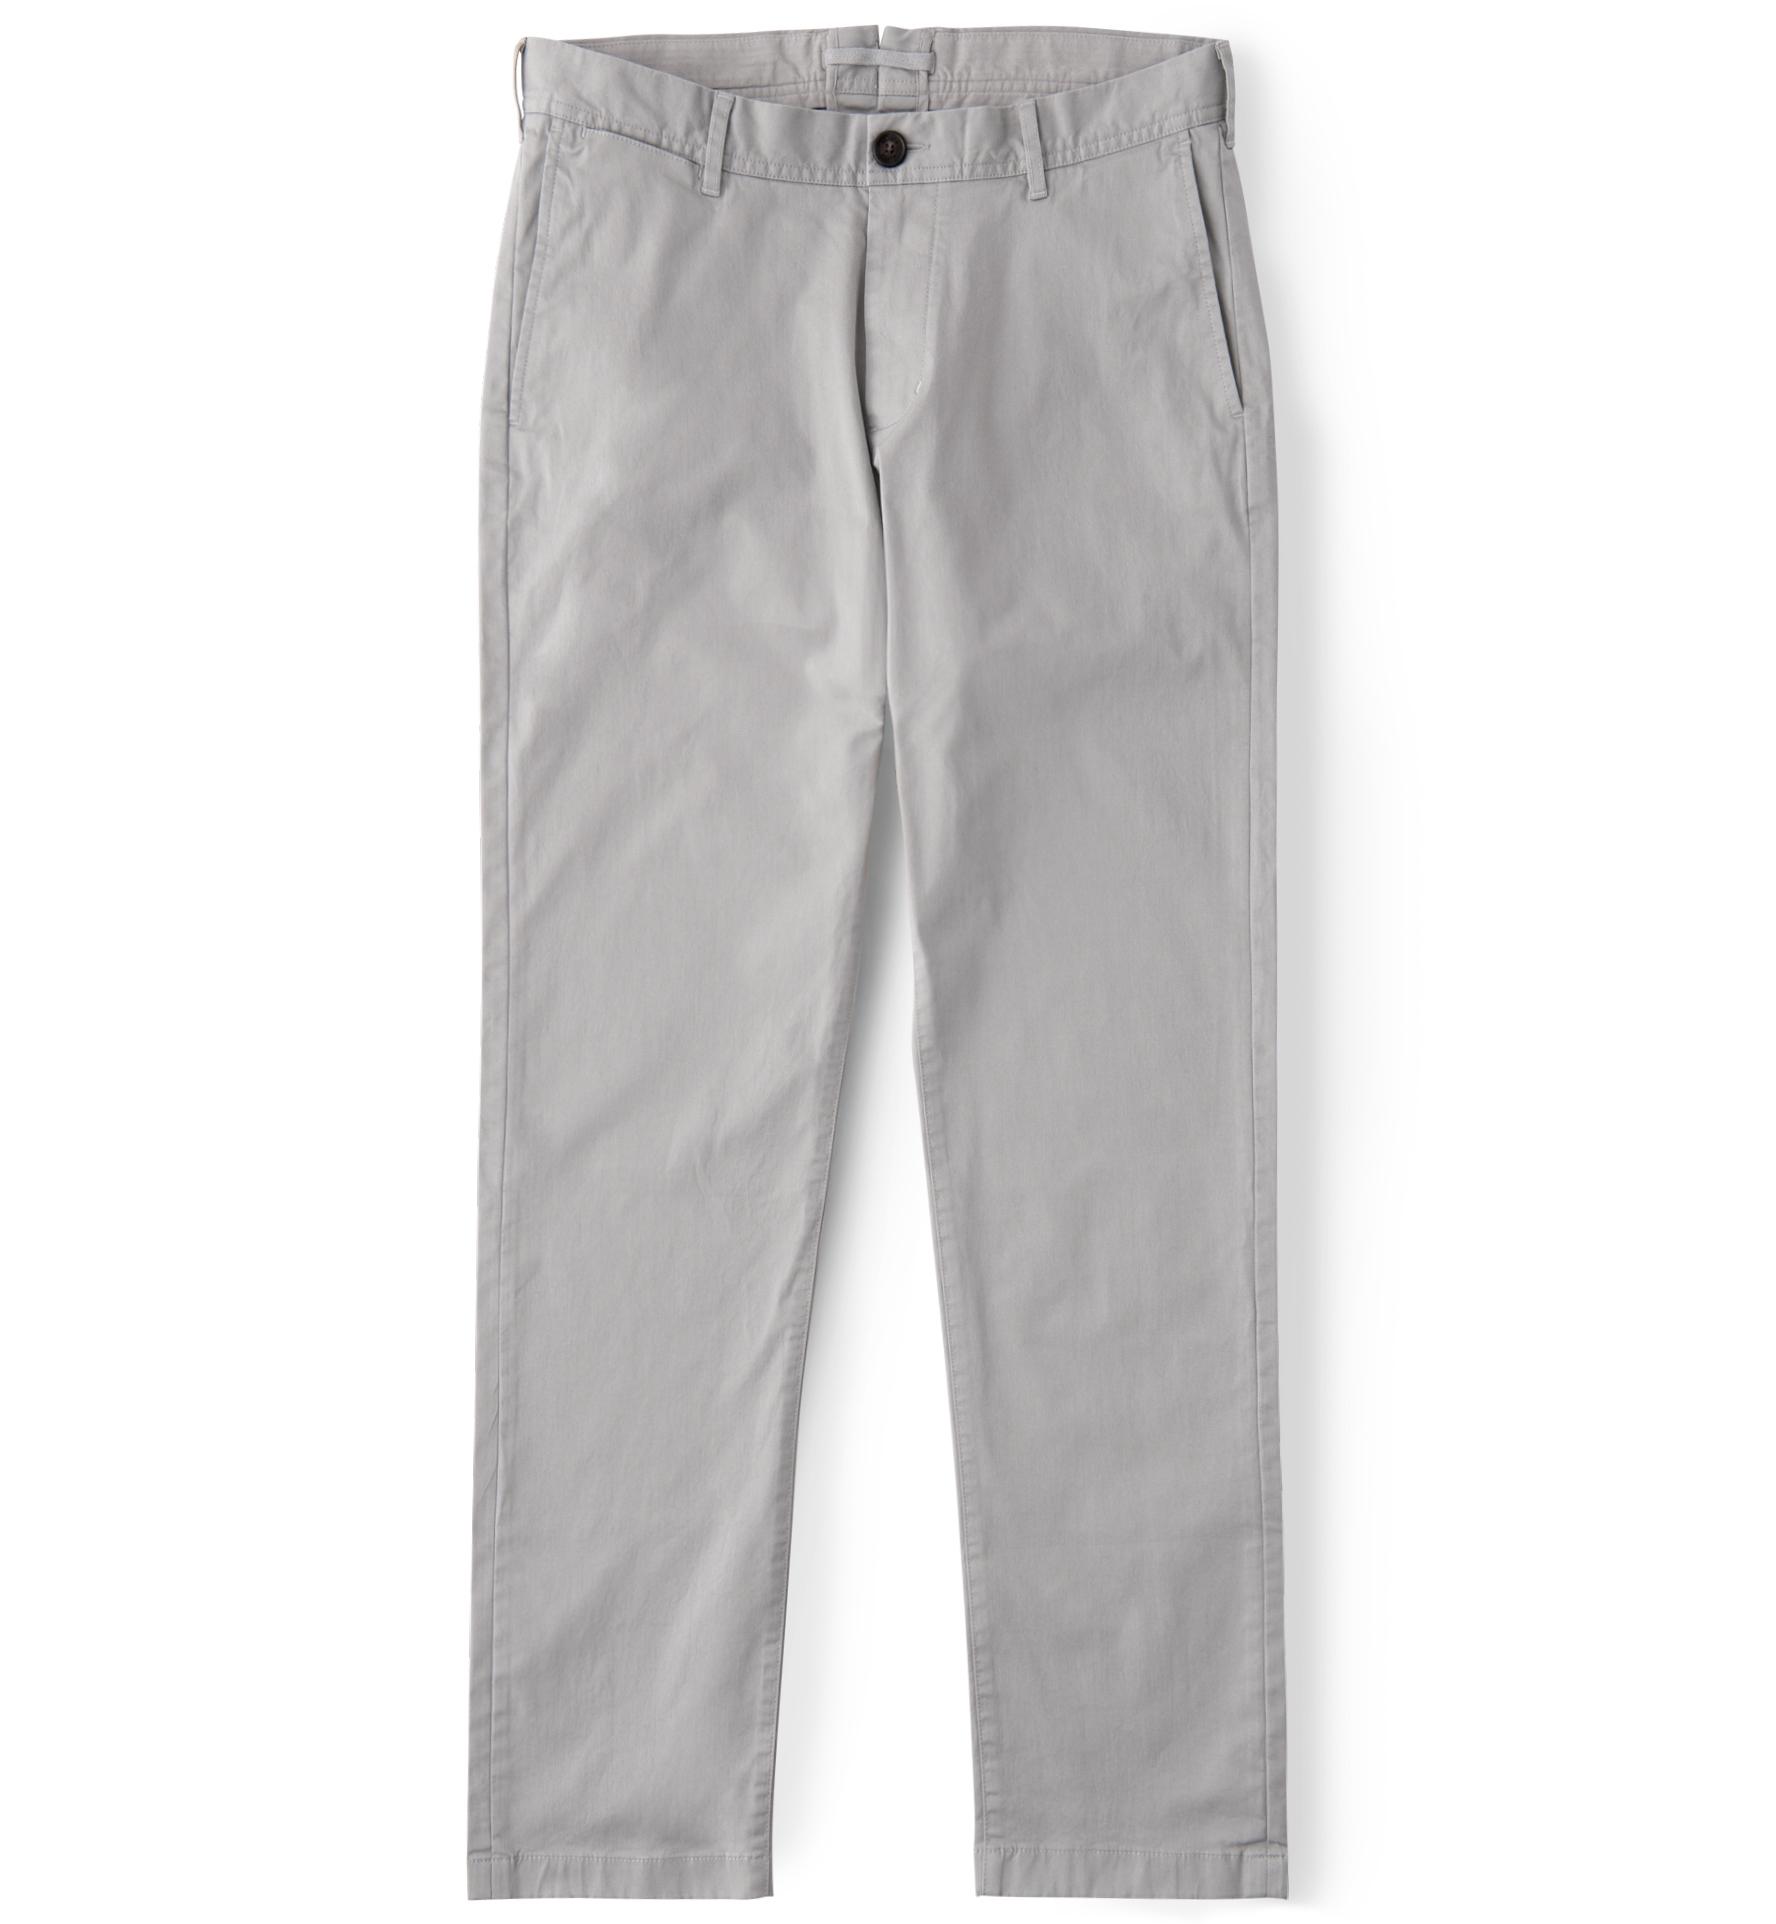 Zoom Image of Bowery Light Grey Stretch Cotton Chino